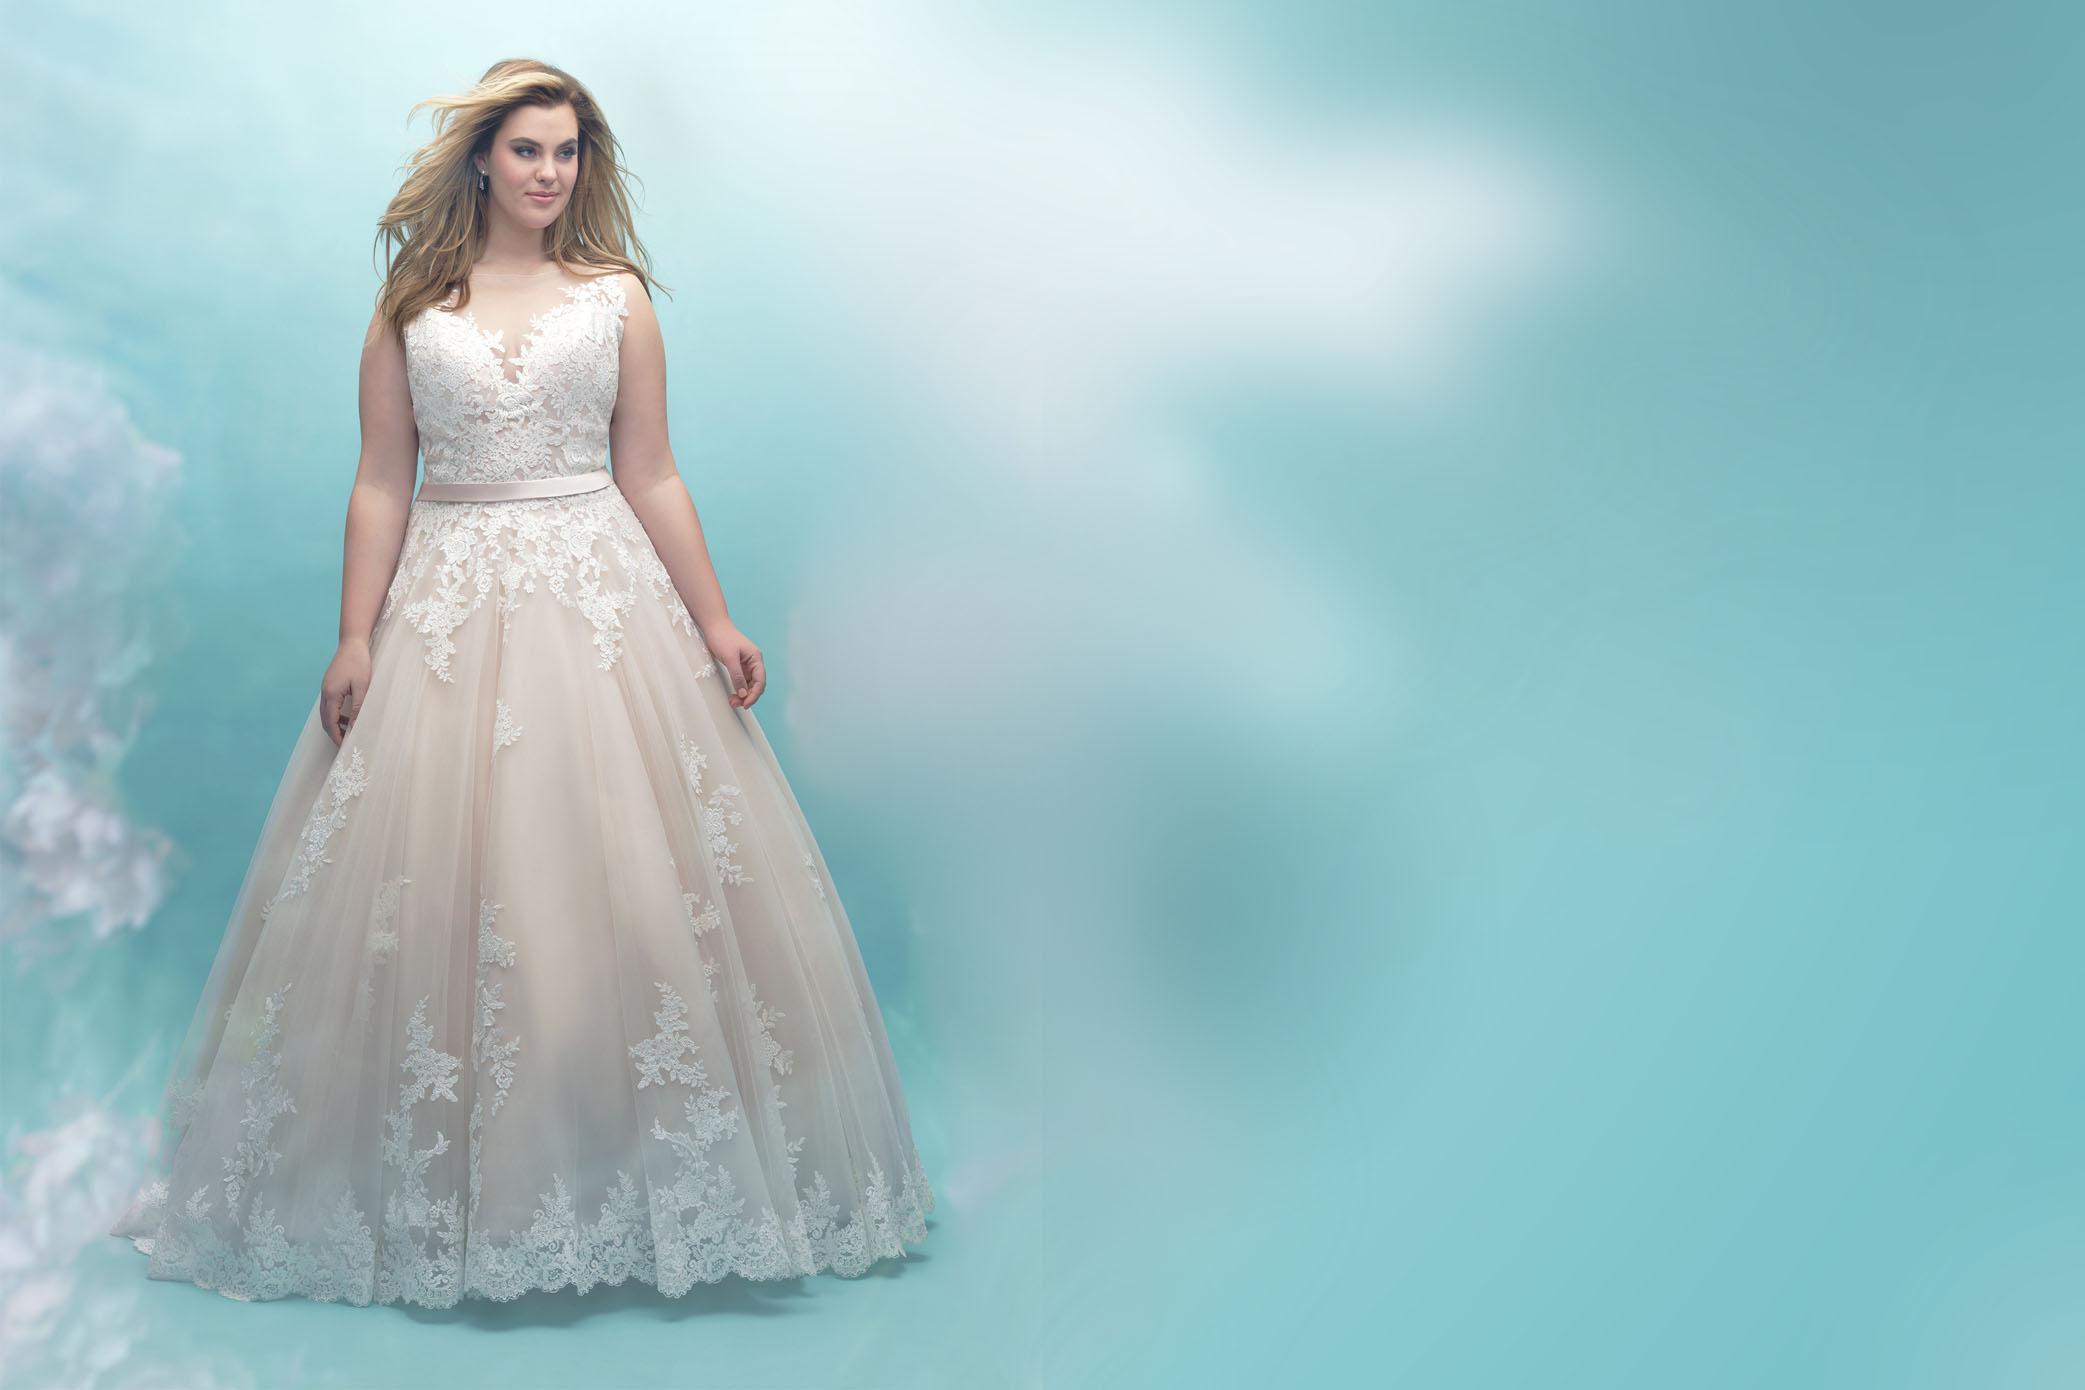 Wedding Dresses, Bridesmaid Dresses | MA Carr Bridal |Buffalo ...